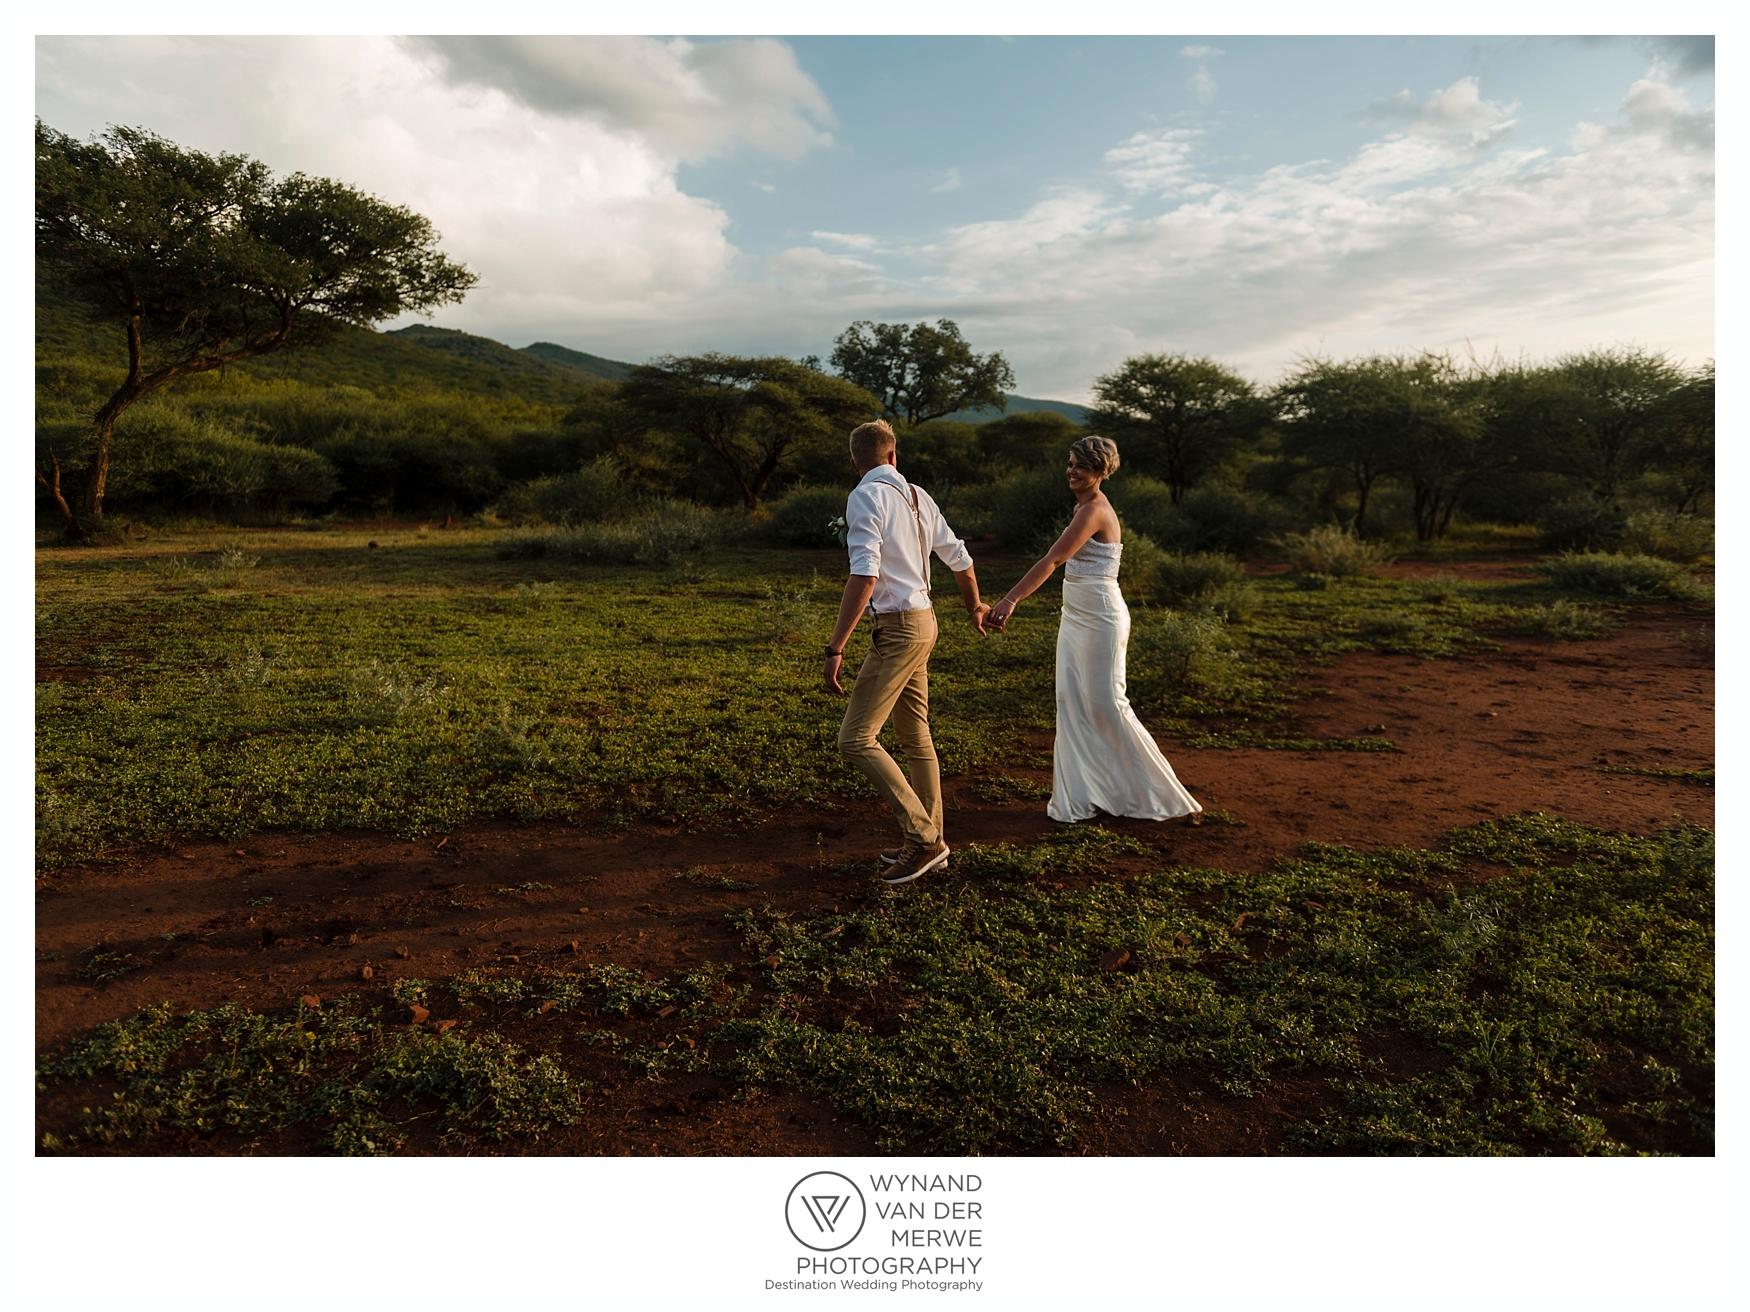 WynandvanderMerwe_weddingphotography_bushveldwedding_northam_bushveld_limpopowedding_limpopo_southafrica-250.jpg